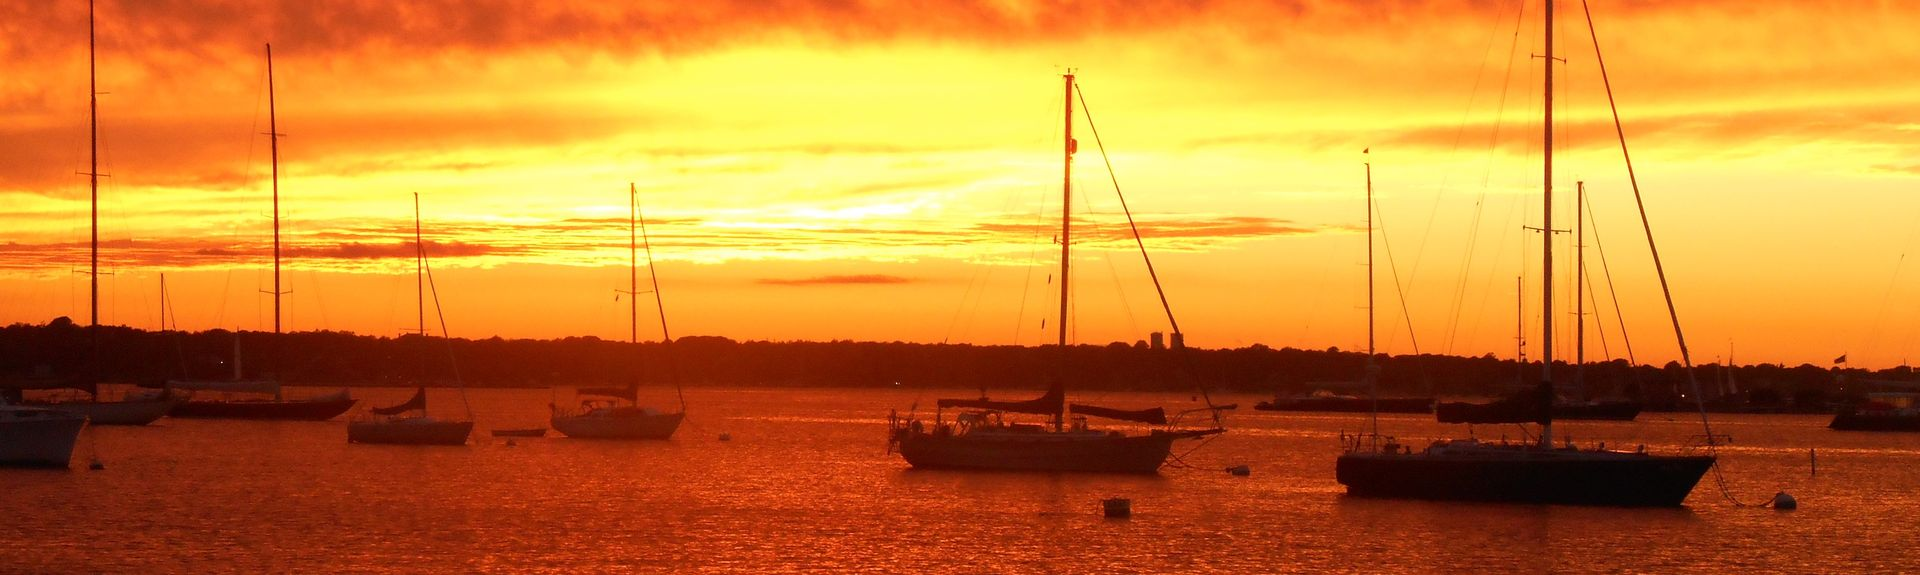 Yachting Village, Newport, Rhode Island, United States of America